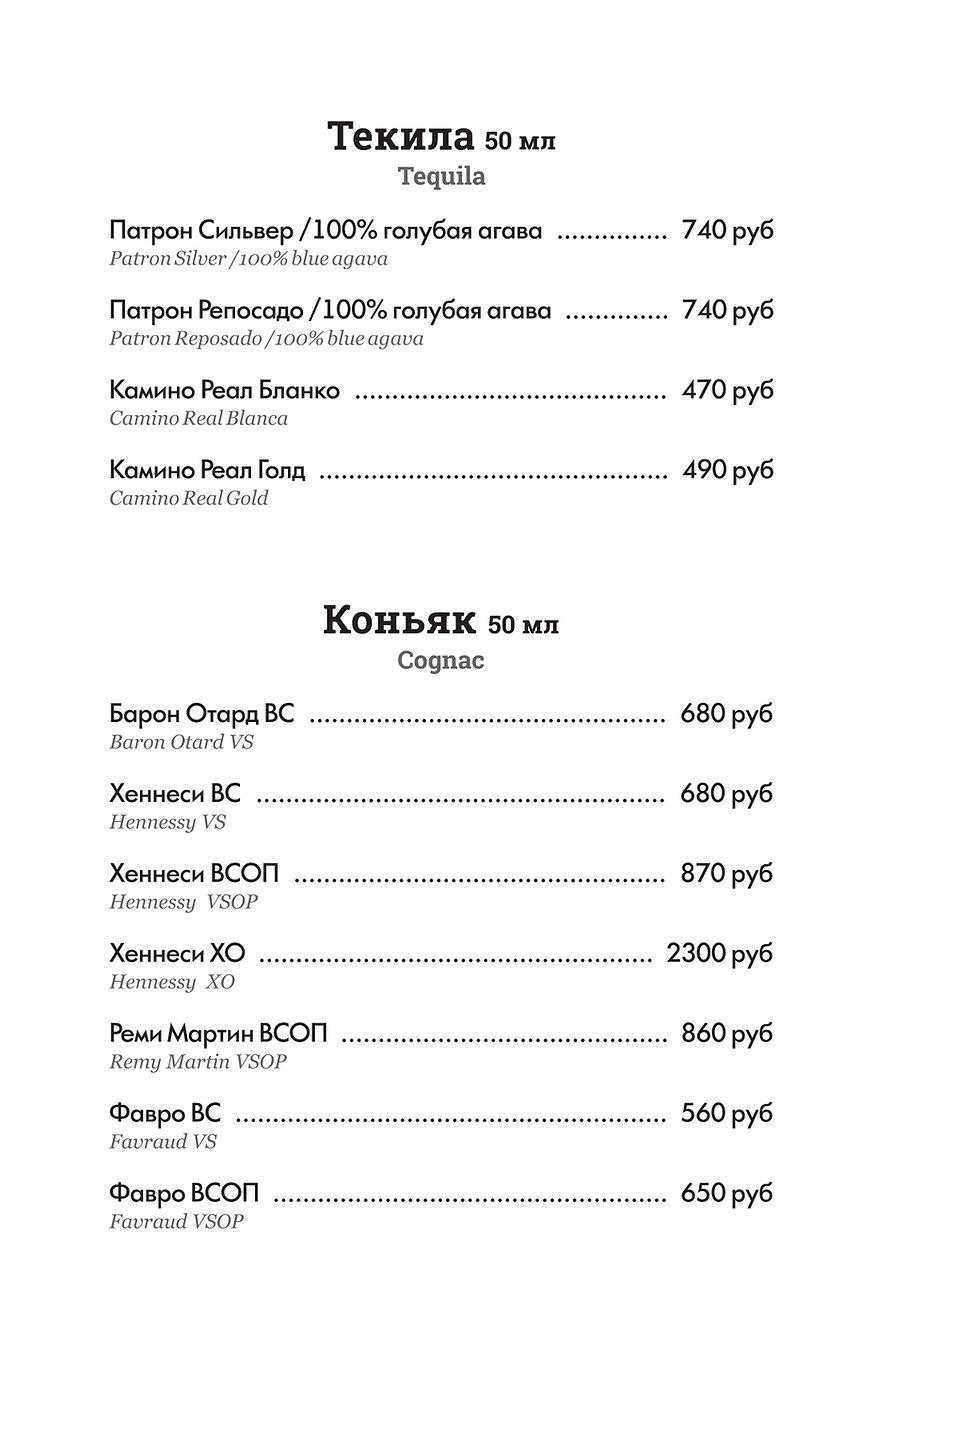 S46_bar_2021_ (2)_page-0012.jpg